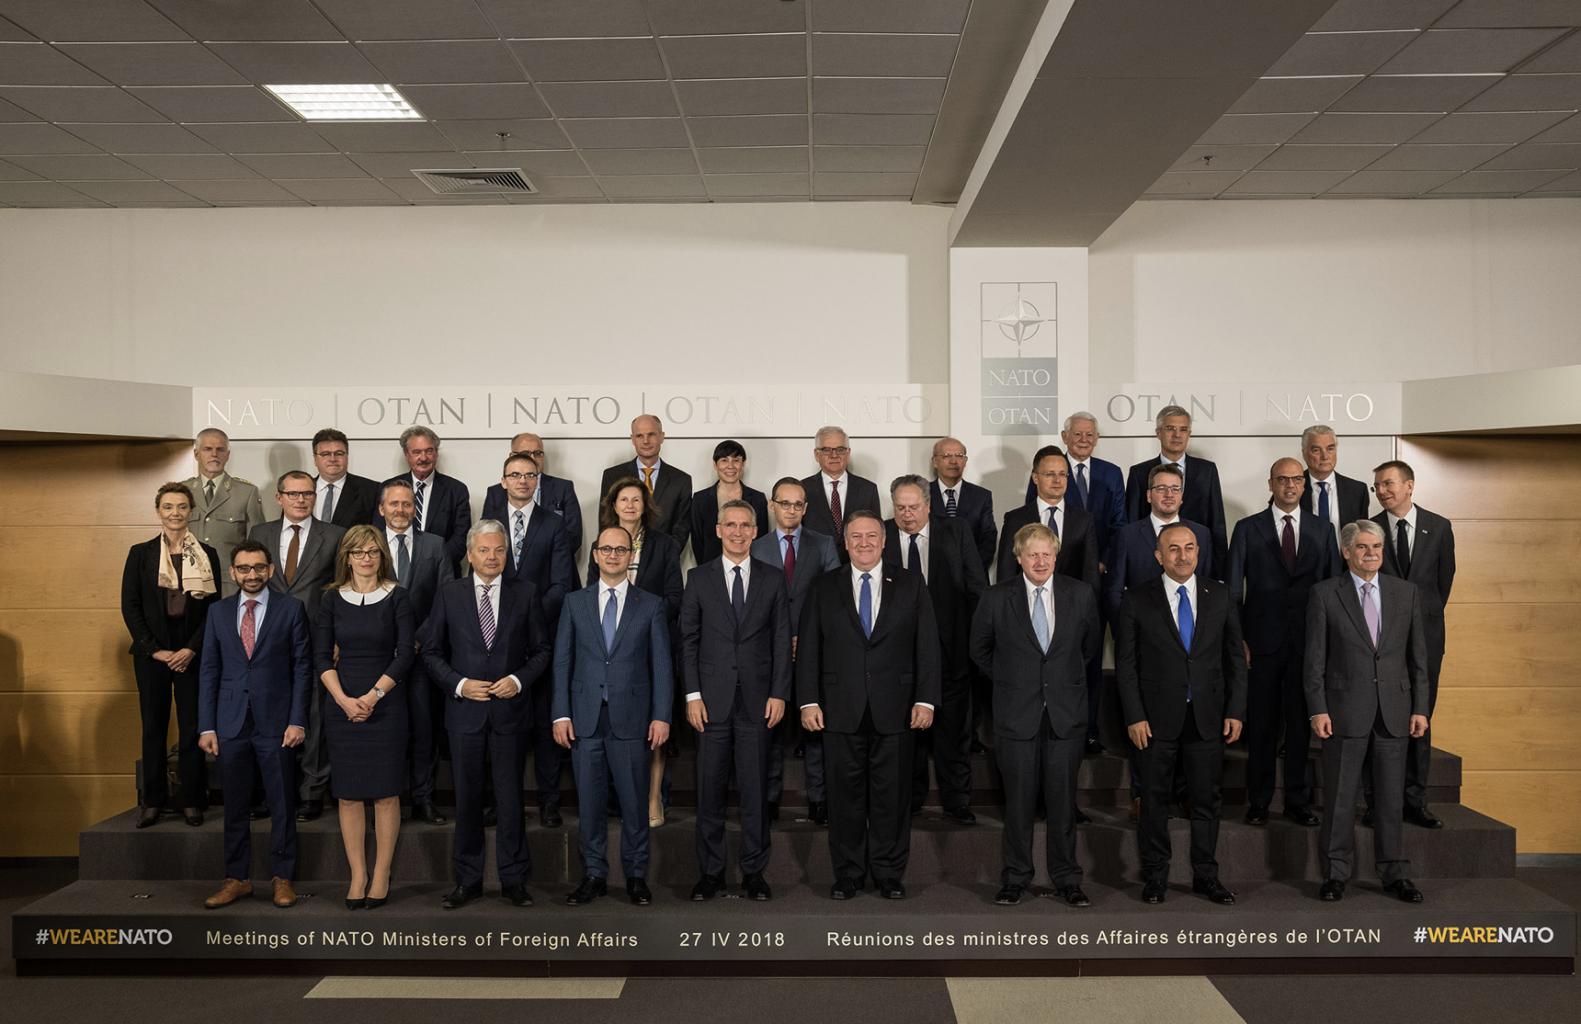 NATO in Focus: NATO Foreign Ministerial (FORMIN) April 2018